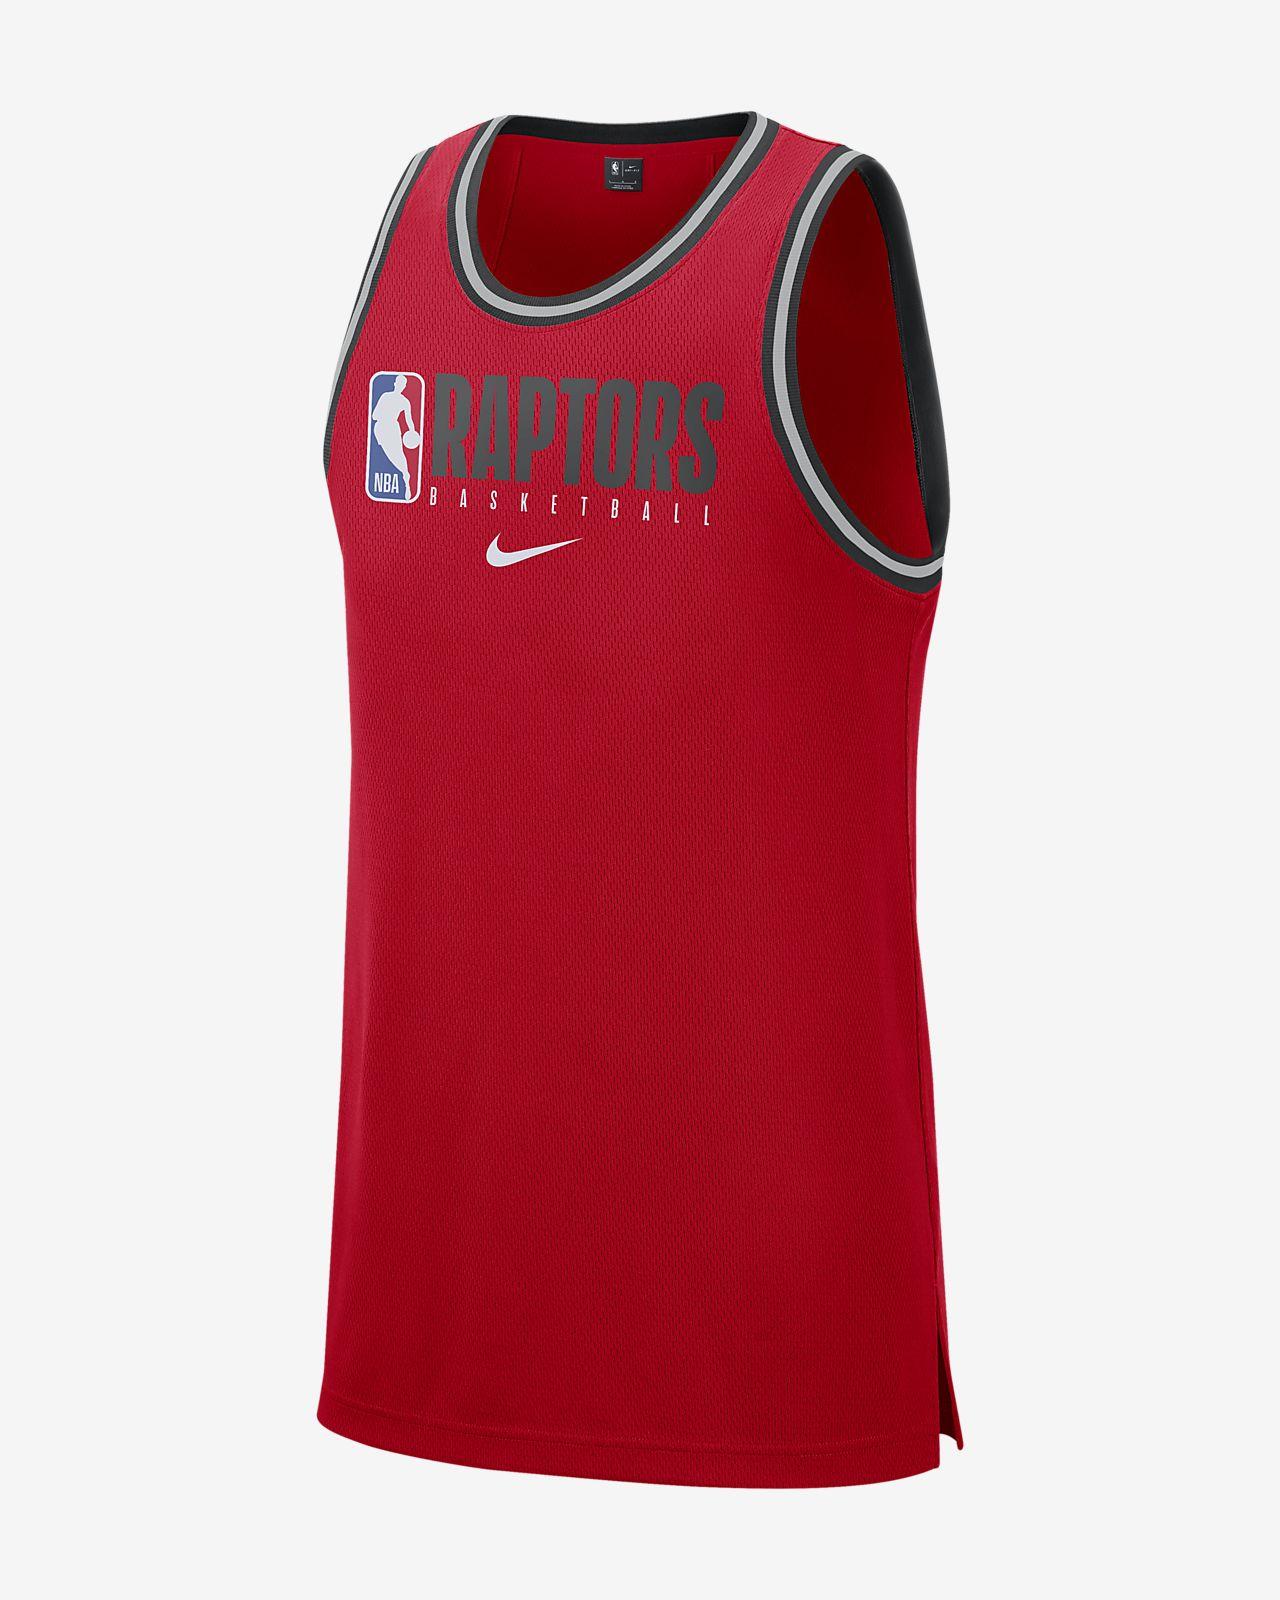 Toronto Raptors Nike Dri-FIT Men's NBA Tank